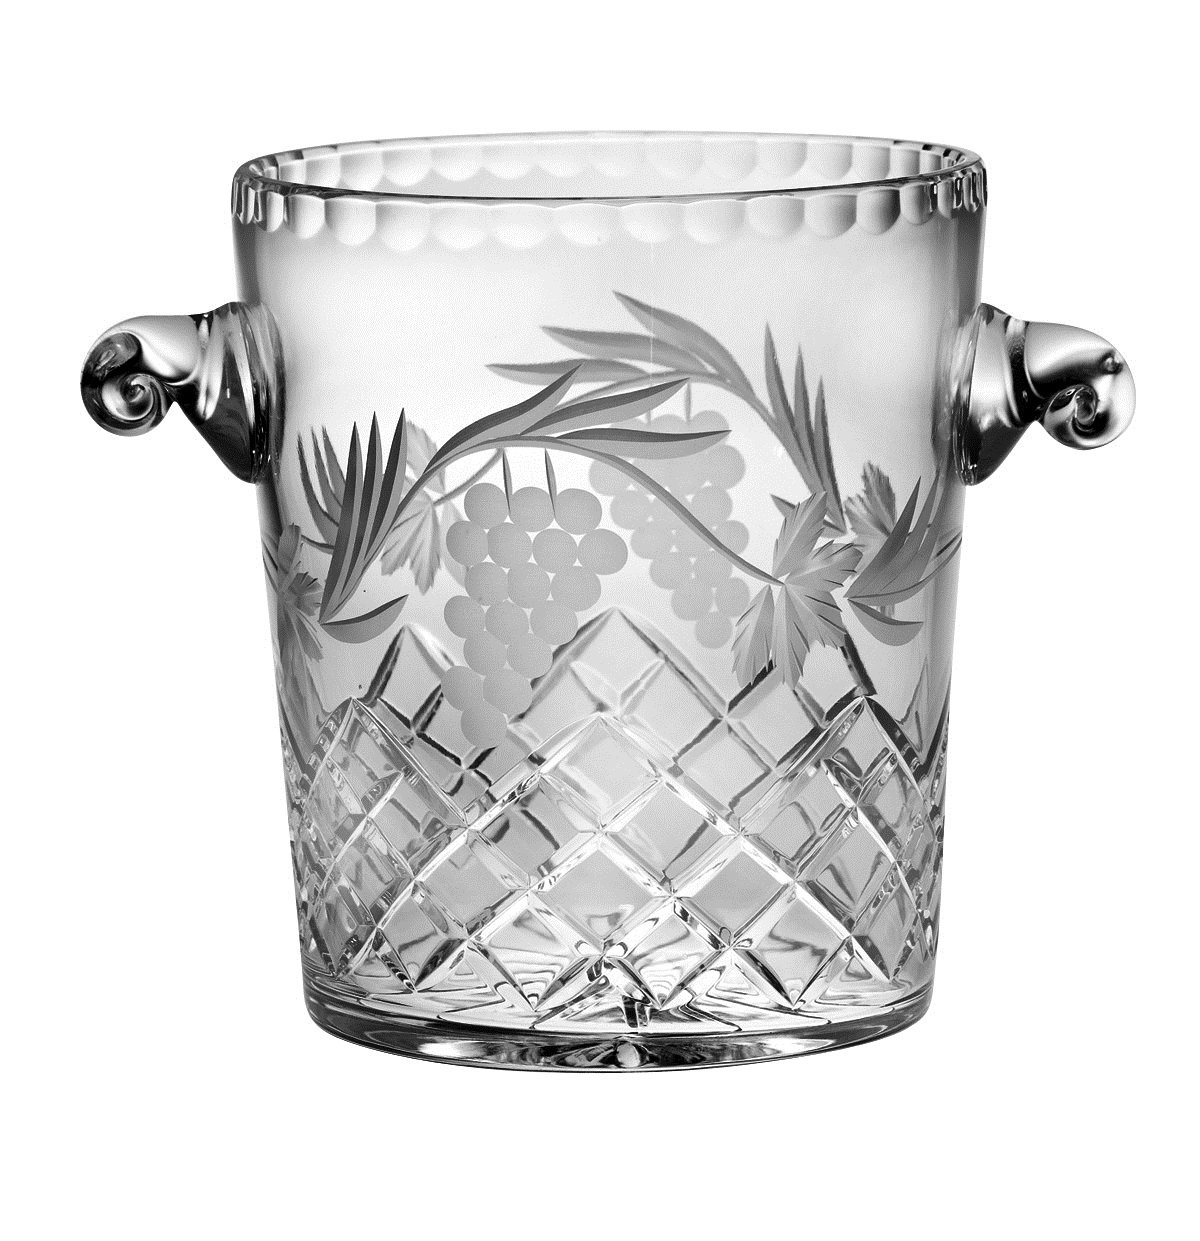 Majestic Gifts AC649GR Handmade European Crystal Ice Bucket, 8.5''H, Clear